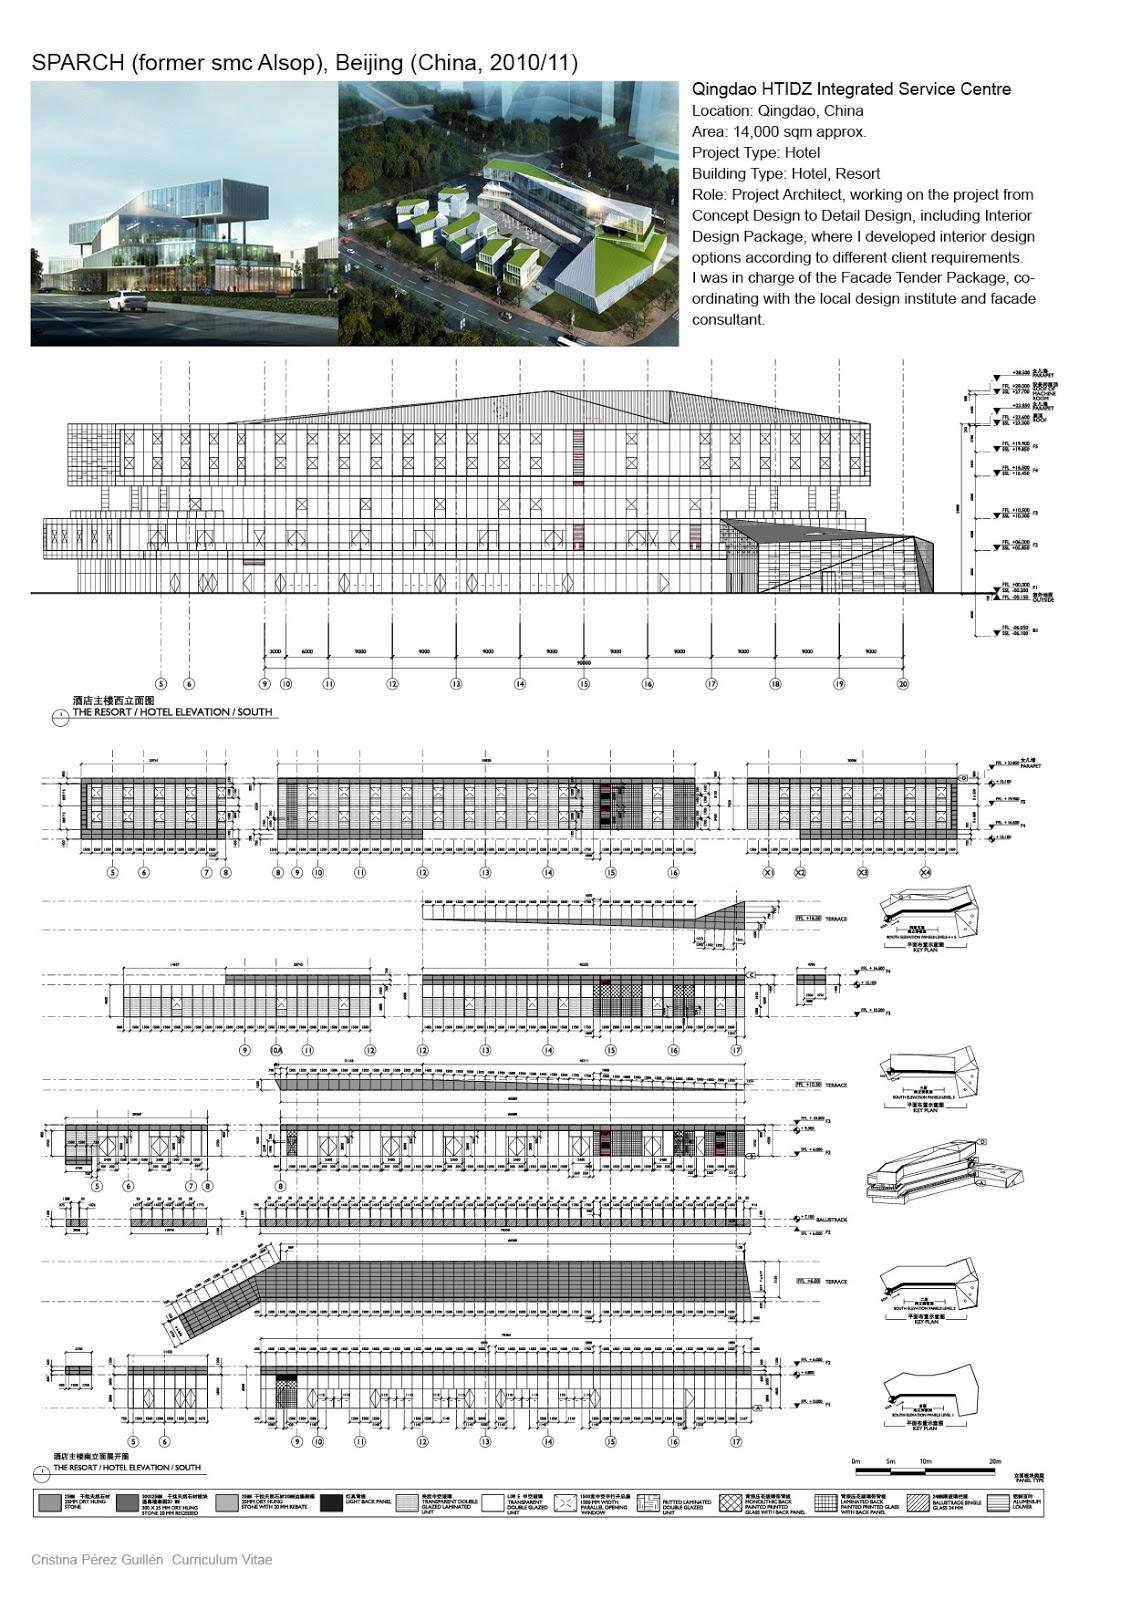 one team architects cristina p eacute rez guill eacute n cv cristina peacuterez guilleacuten cv